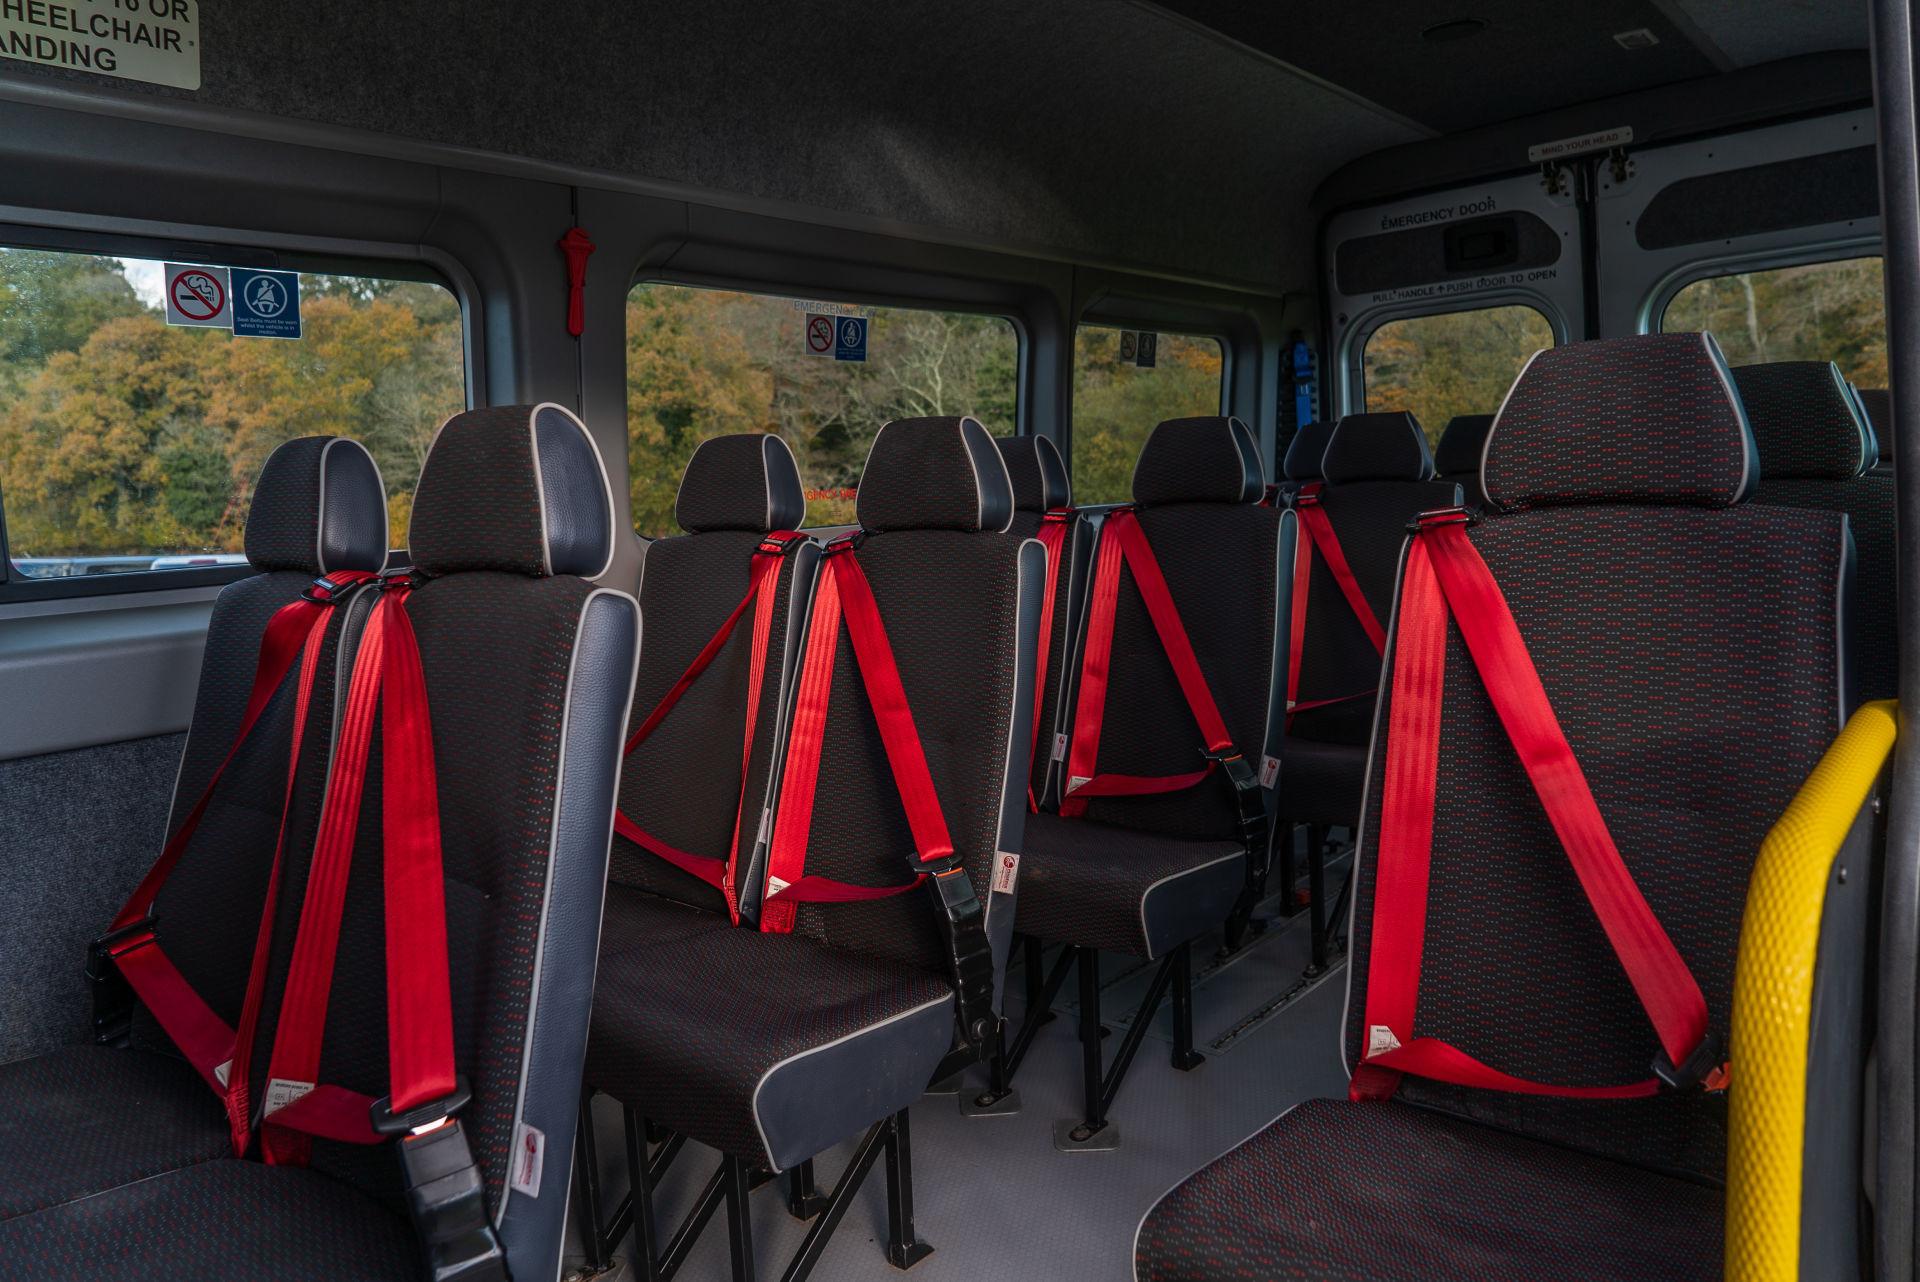 2015 Peugeot Boxer 17 Seater Accessible Minibus for Sale - Image 2